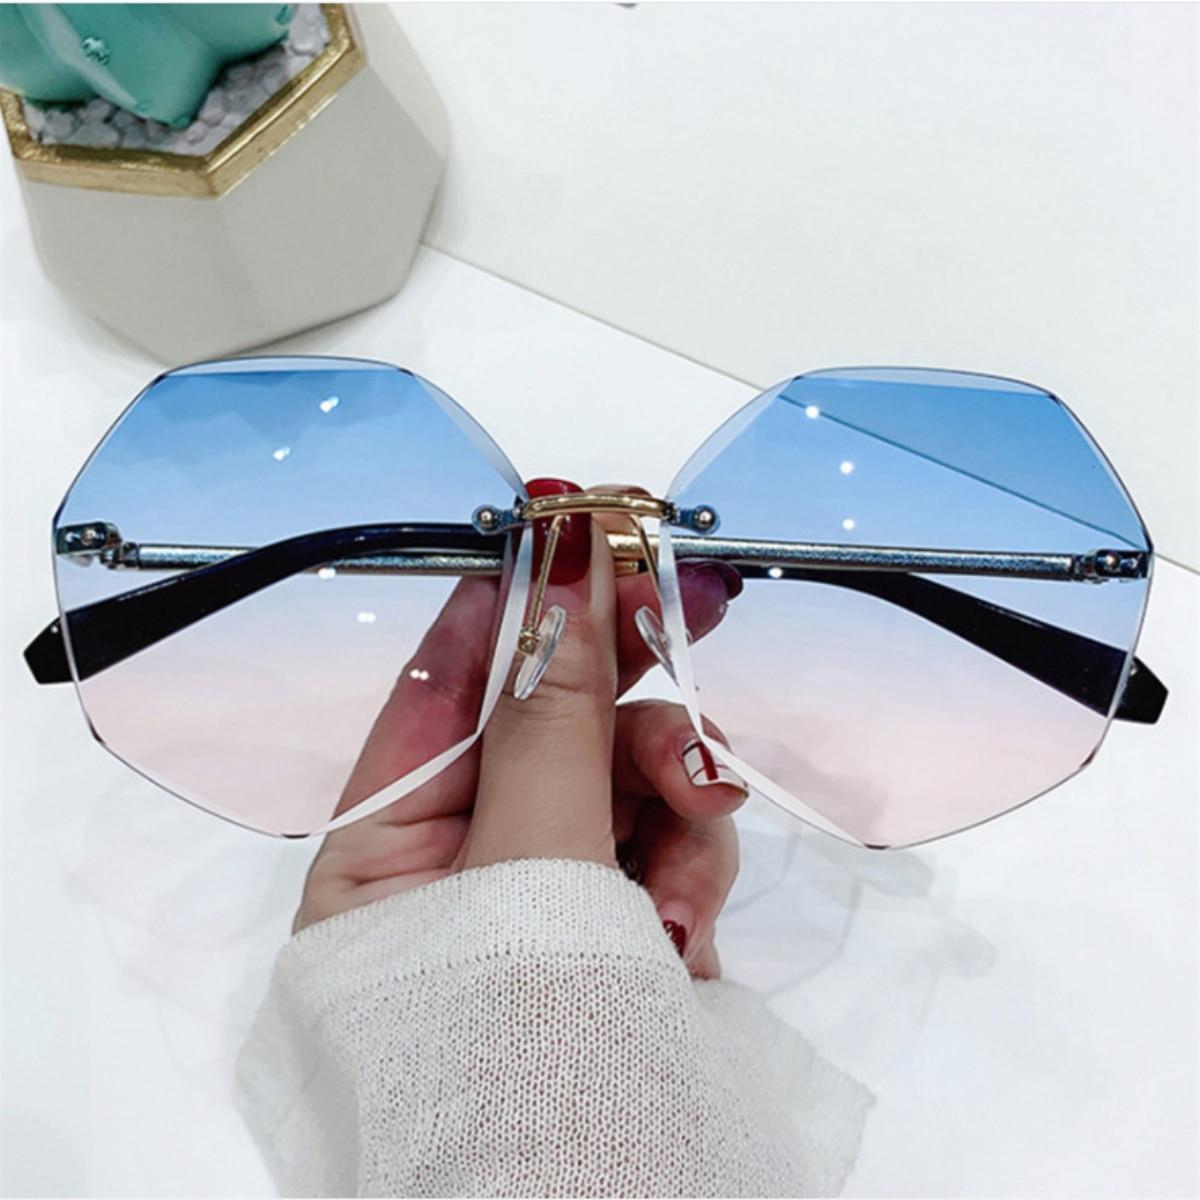 2021 new metal frameless Sunglasses European and American fashion glasses trimming Sunglasses polygonal women's Sunglasses